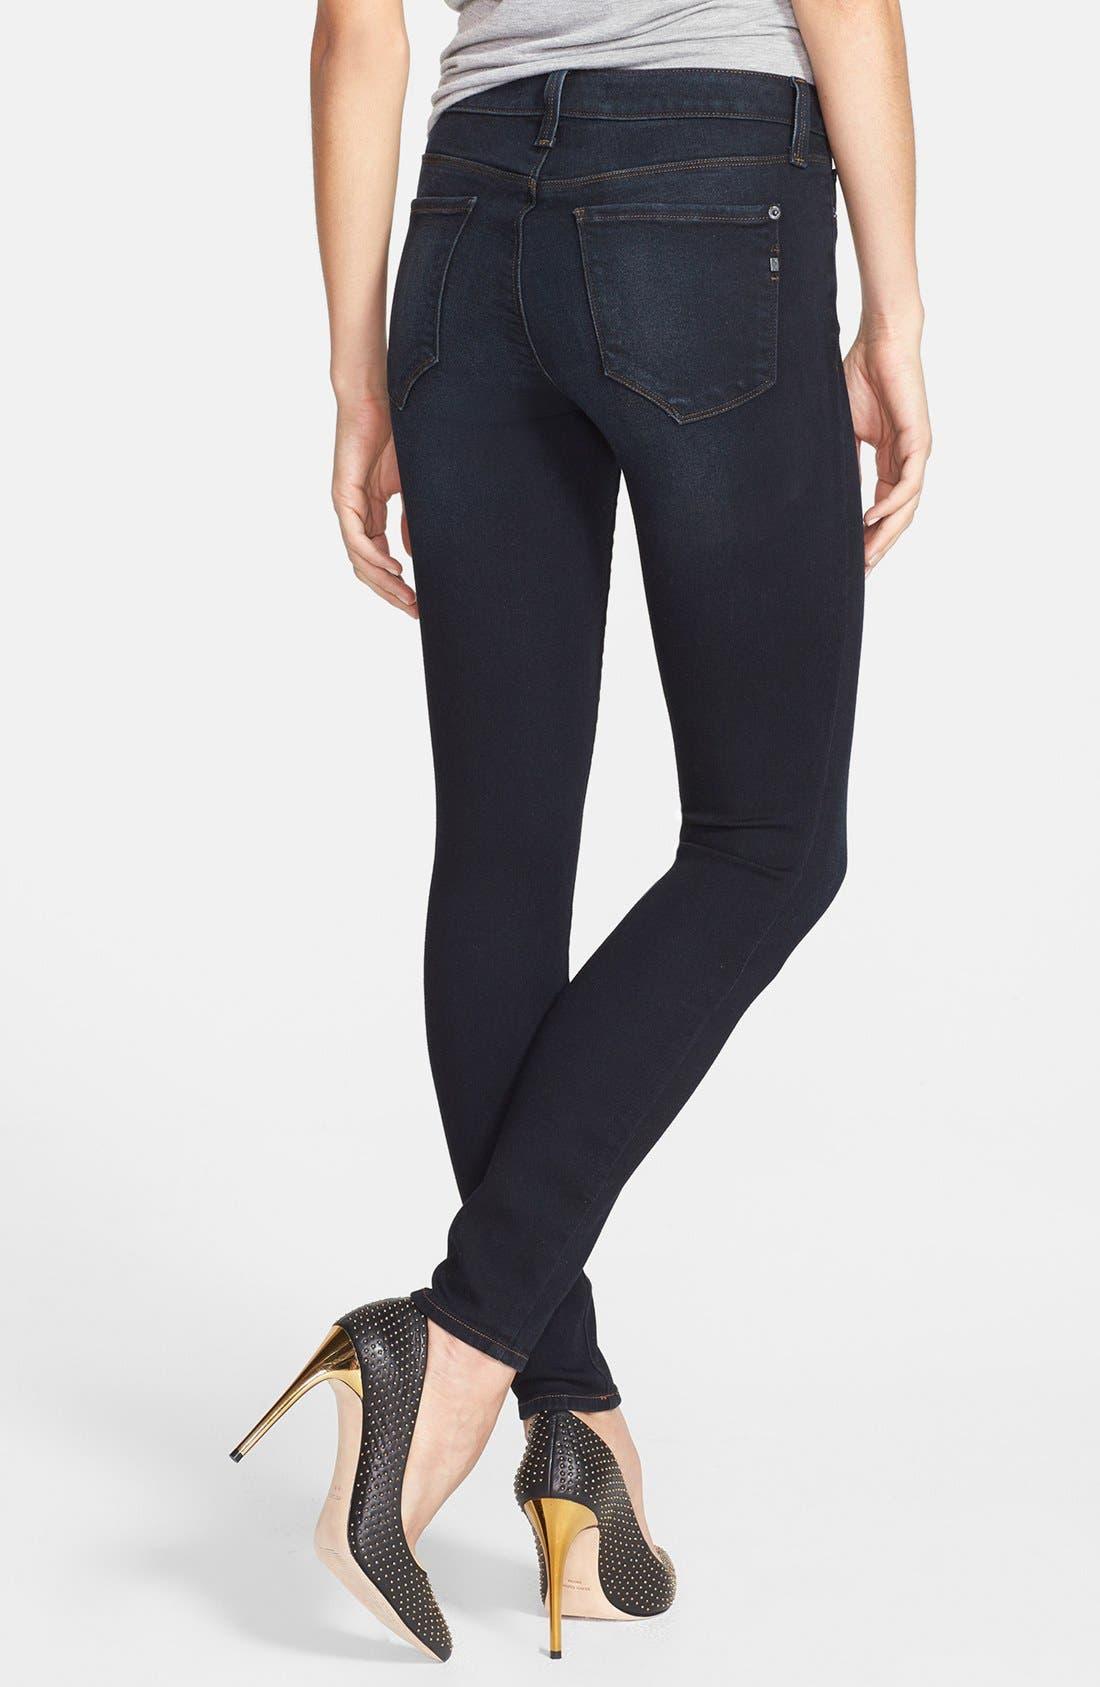 Alternate Image 2  - Genetic 'The Stem' Cigarette Skinny Jeans (Nomad)